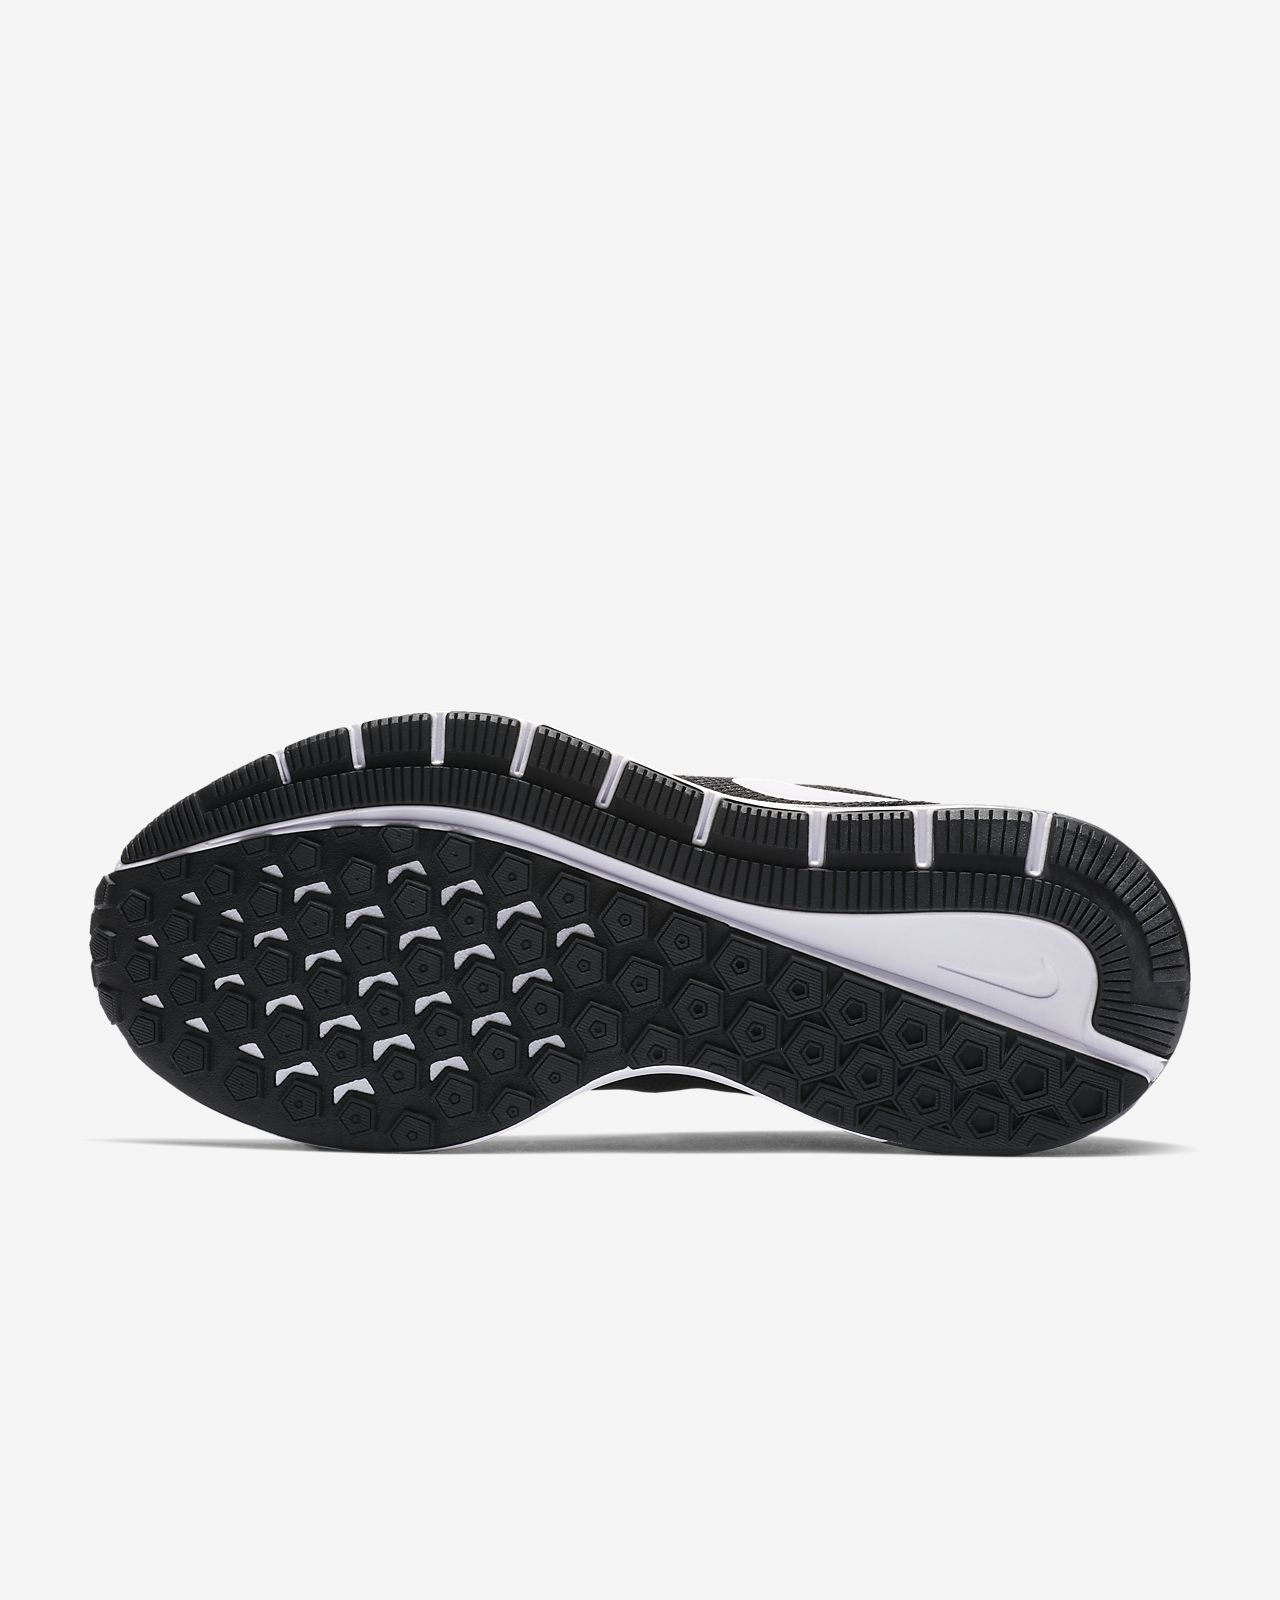 c645887765d Nike Air Zoom Structure 22 Women's Running Shoe